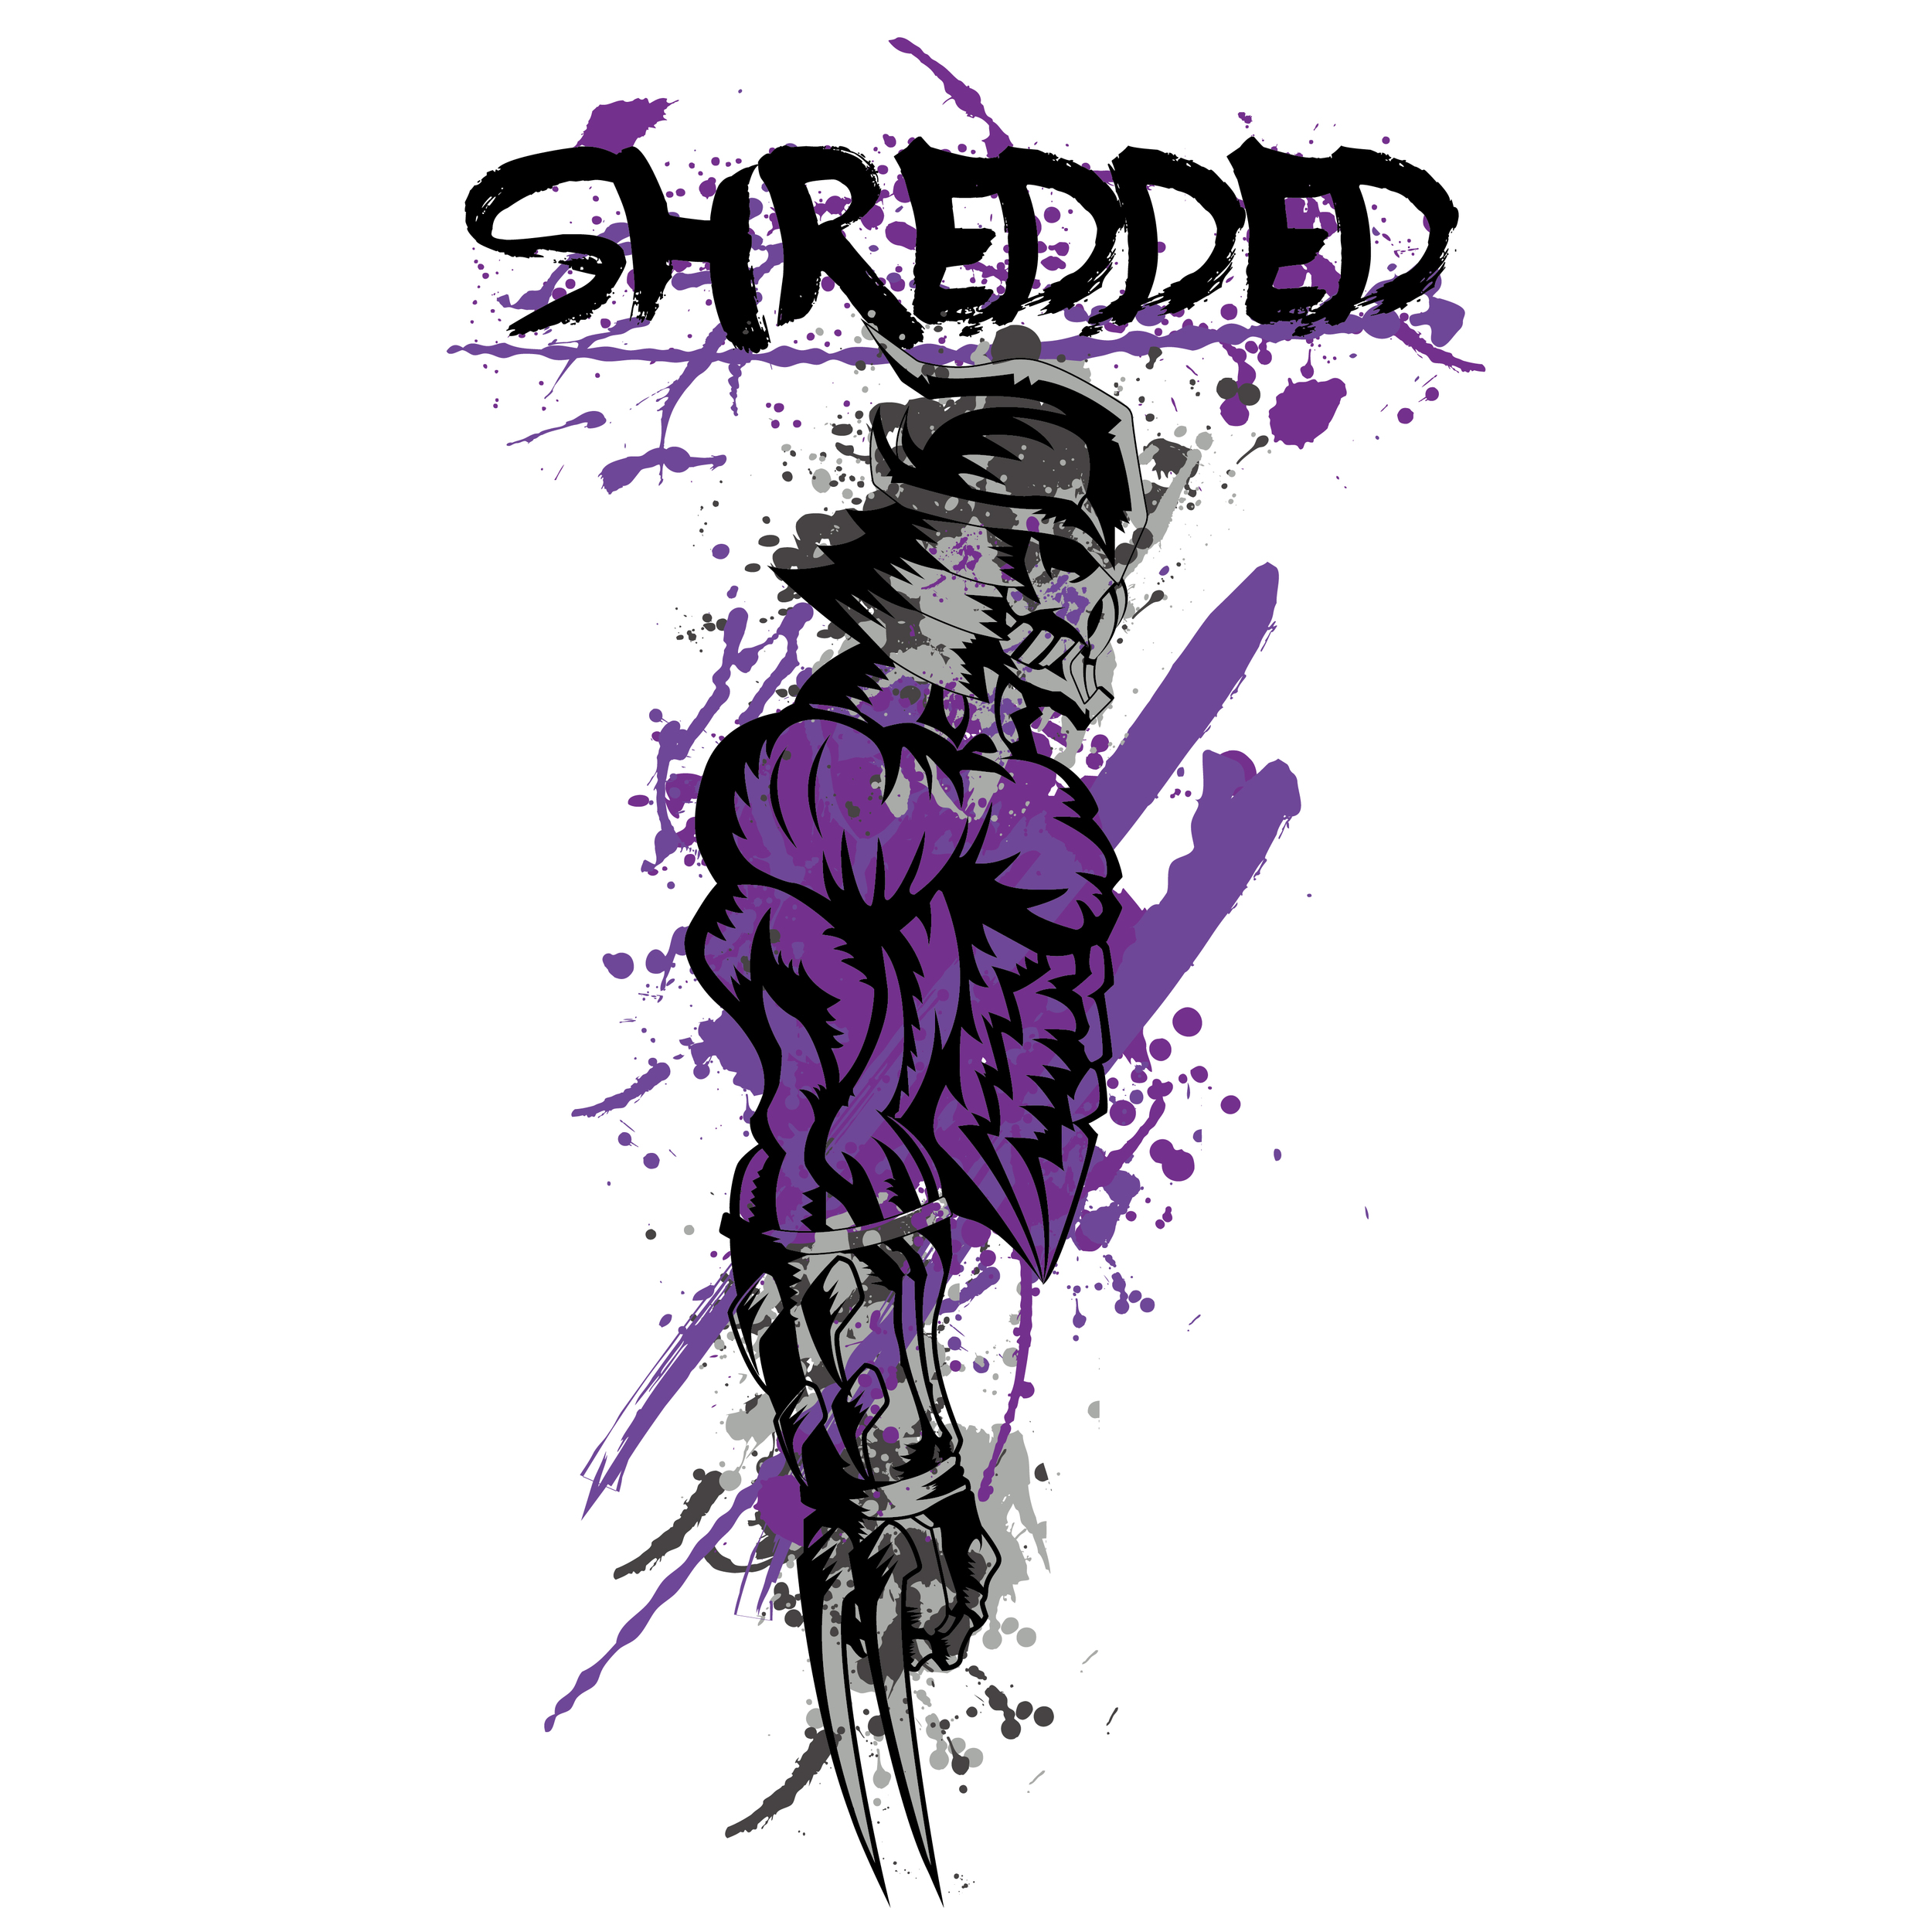 shredded-raskol-apparel-raskolapparel-white-tshirt-omarisuf-omar-isuf-roberto-orozco-artist-design-orozcodesign-studio-purple-silver-japanese-tmnt-shredder-comicbook-foot-clan-teenagemutantninjaturtle.jpg